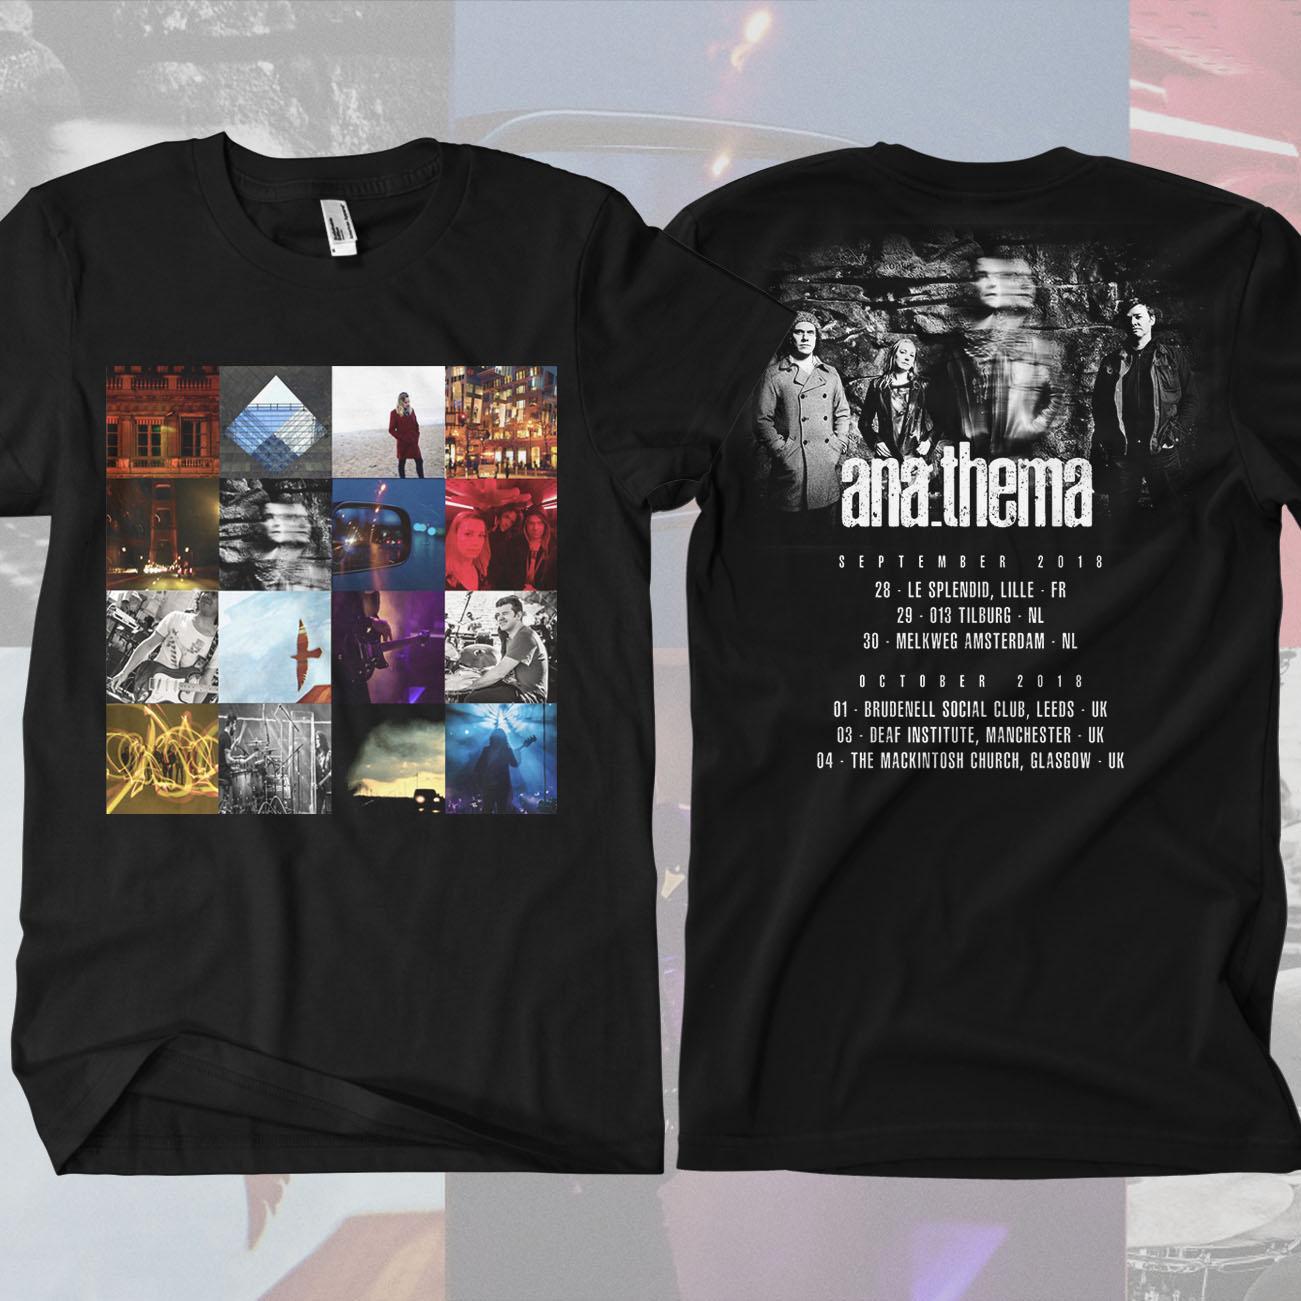 Anathema - 'Ambient Acoustic Tour' T-Shirt - Anathema